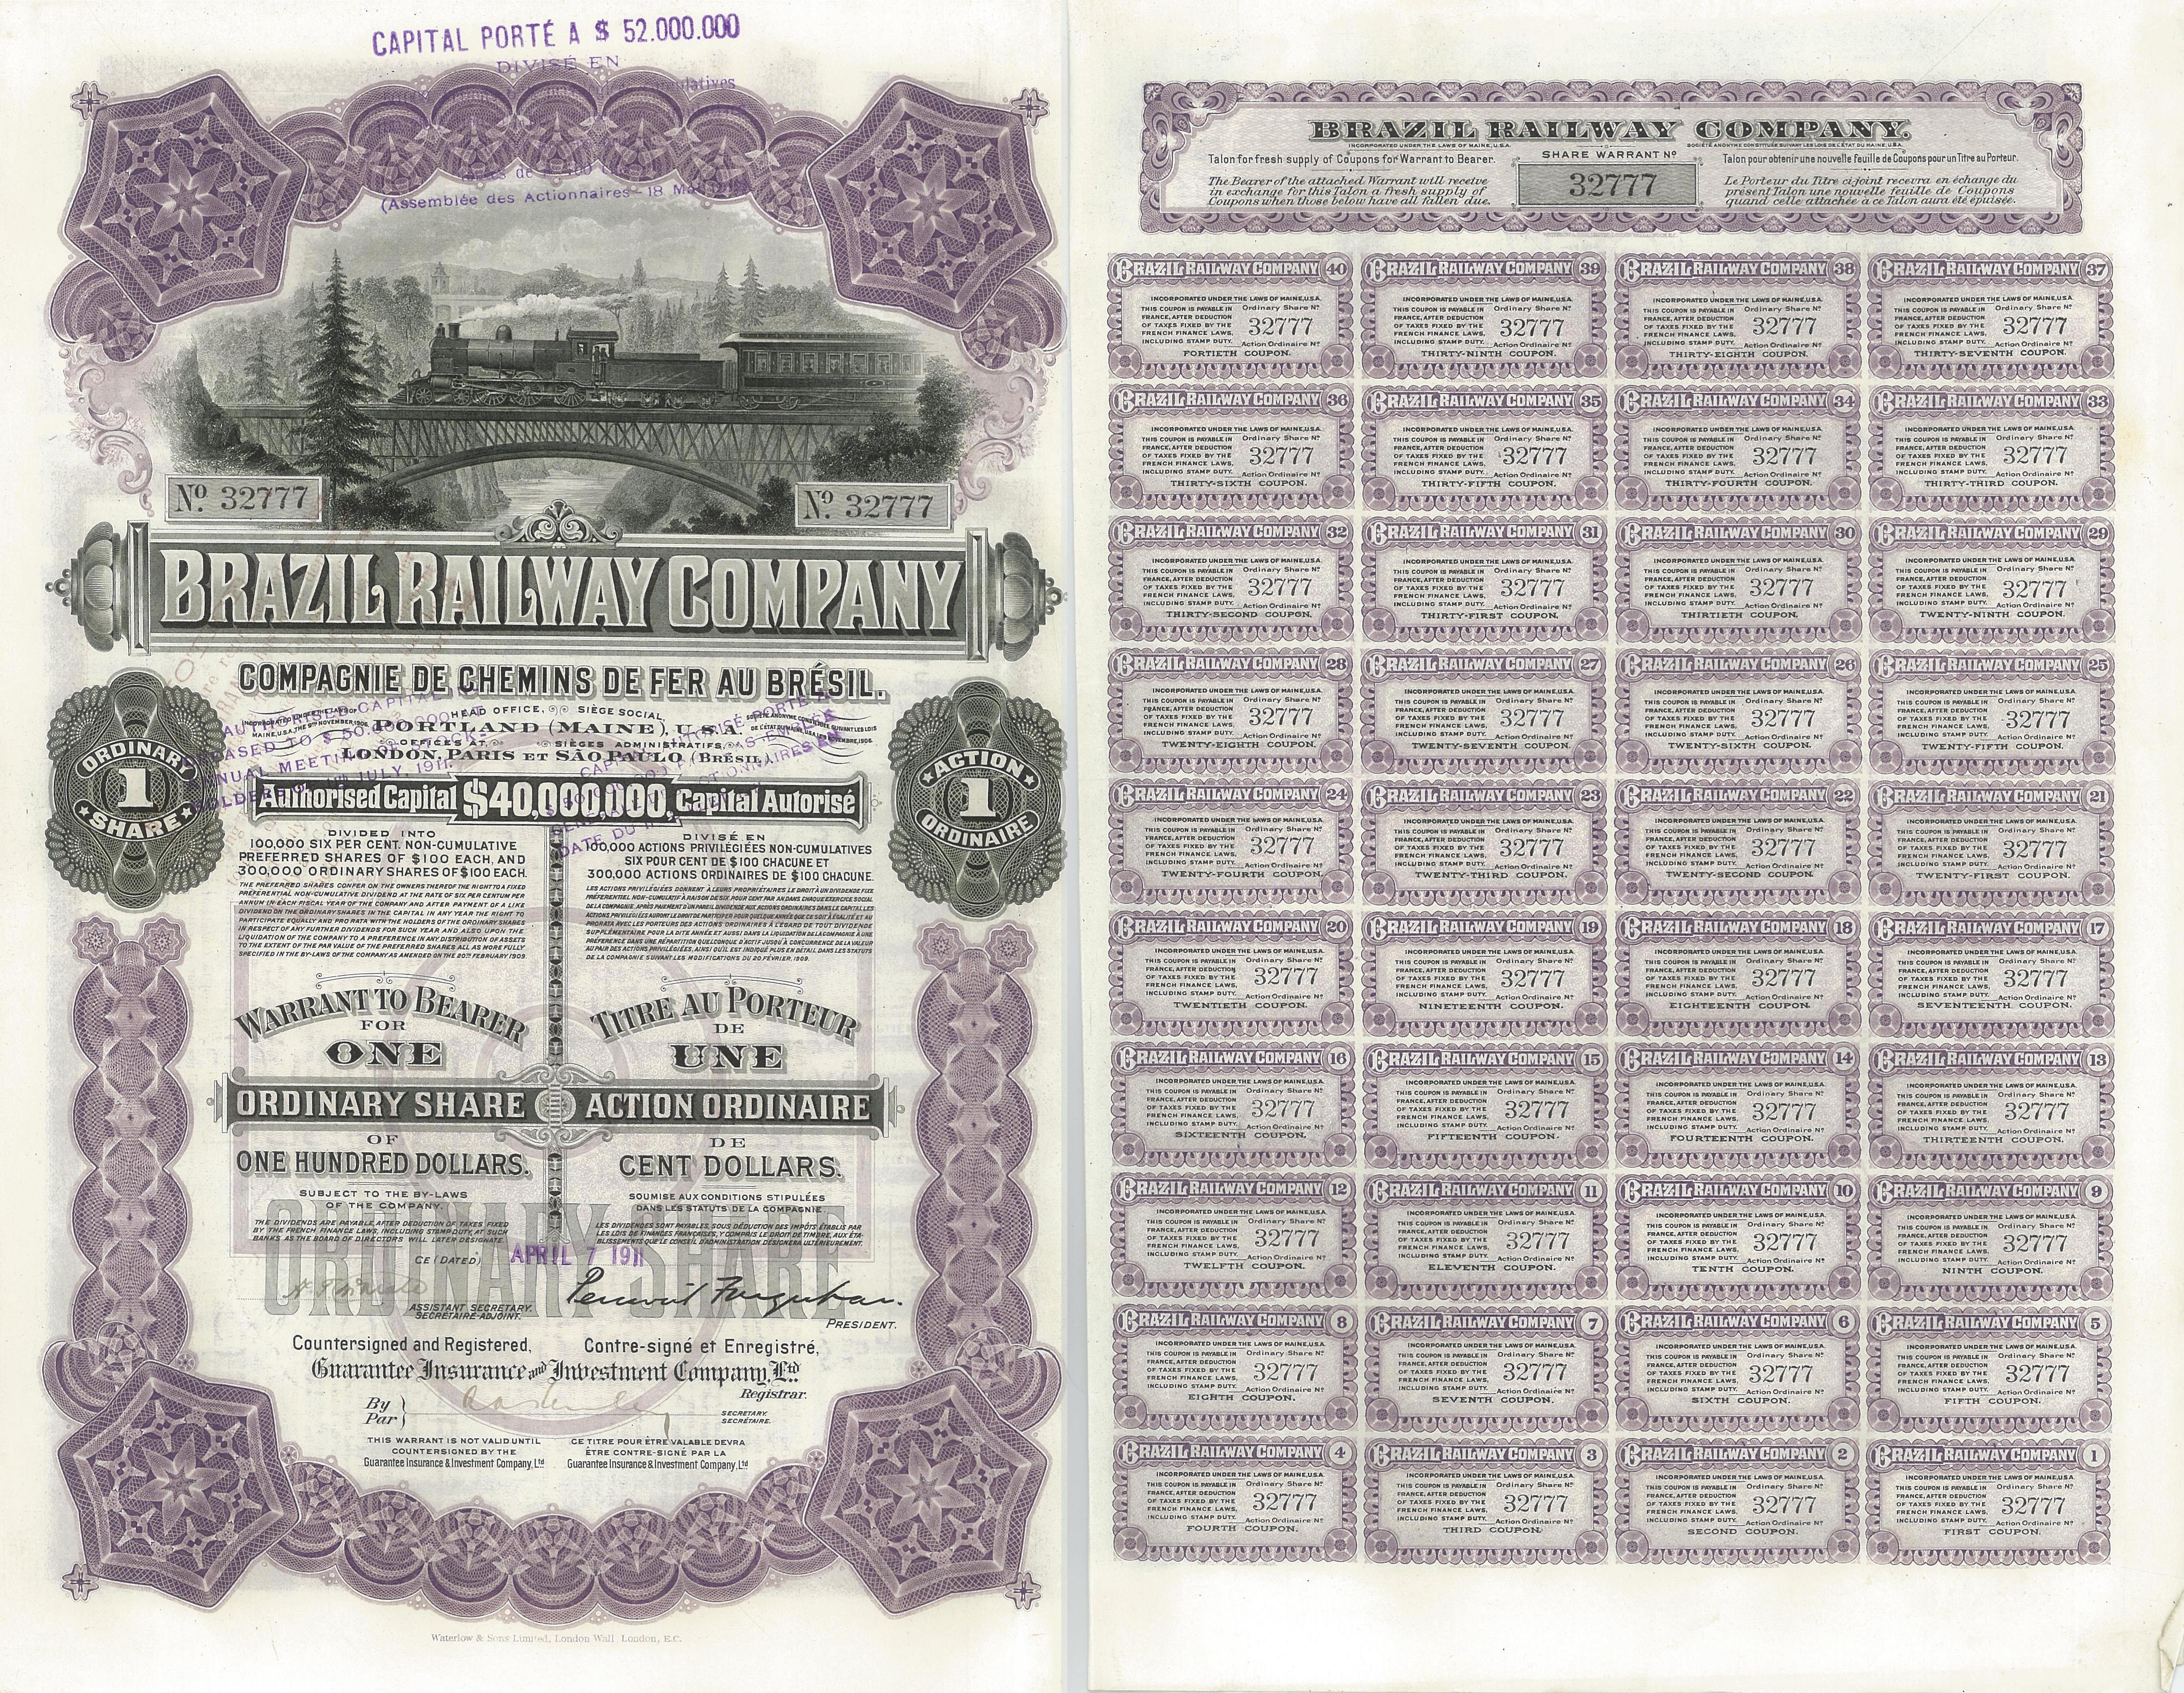 West Shore Railroad Company Bond Stock Certificate New York Central